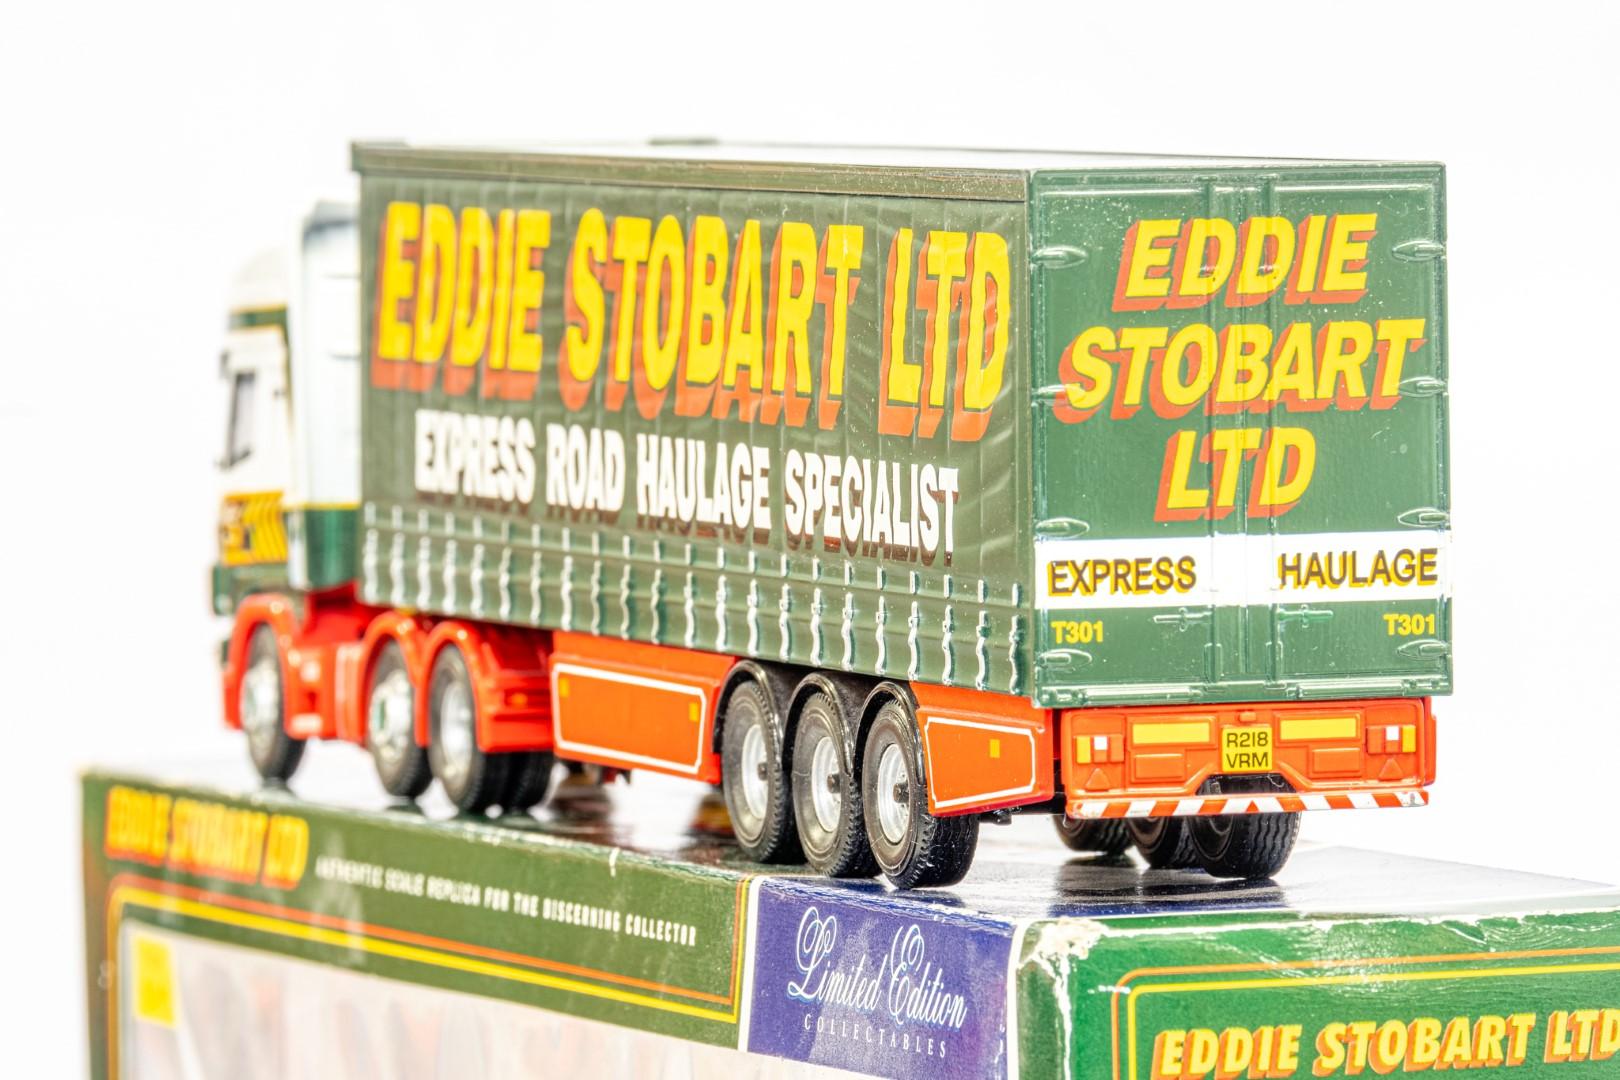 Corgi Scania Topline Curtainside Trailer - Eddie Stobart - Image 5 of 7